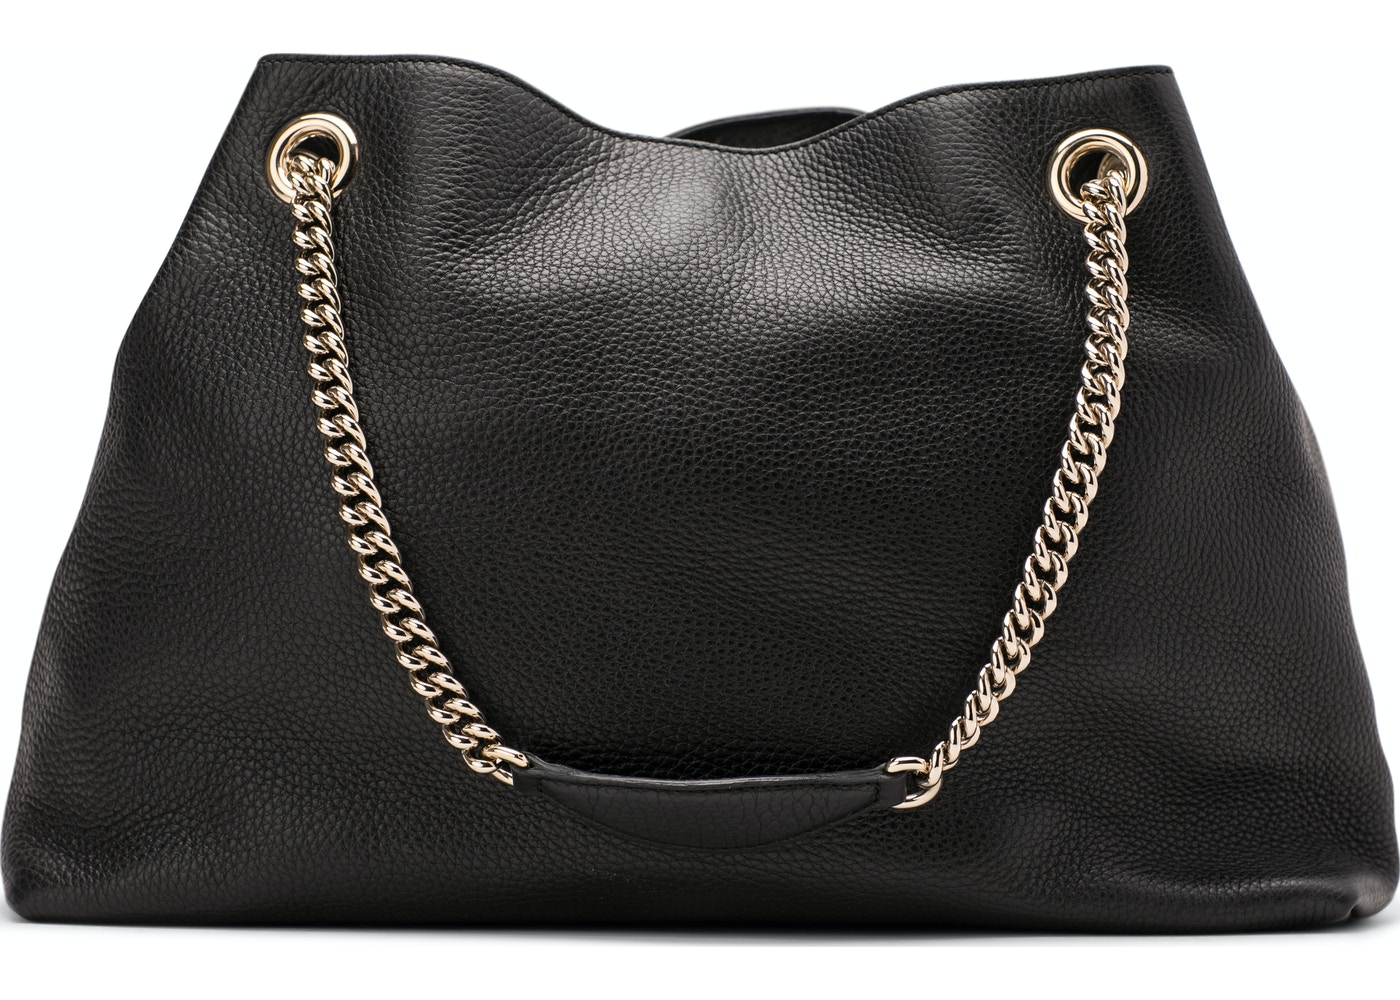 4e0d69aed47 Gucci Soho Shoulder Bag Chain Strap Medium Black